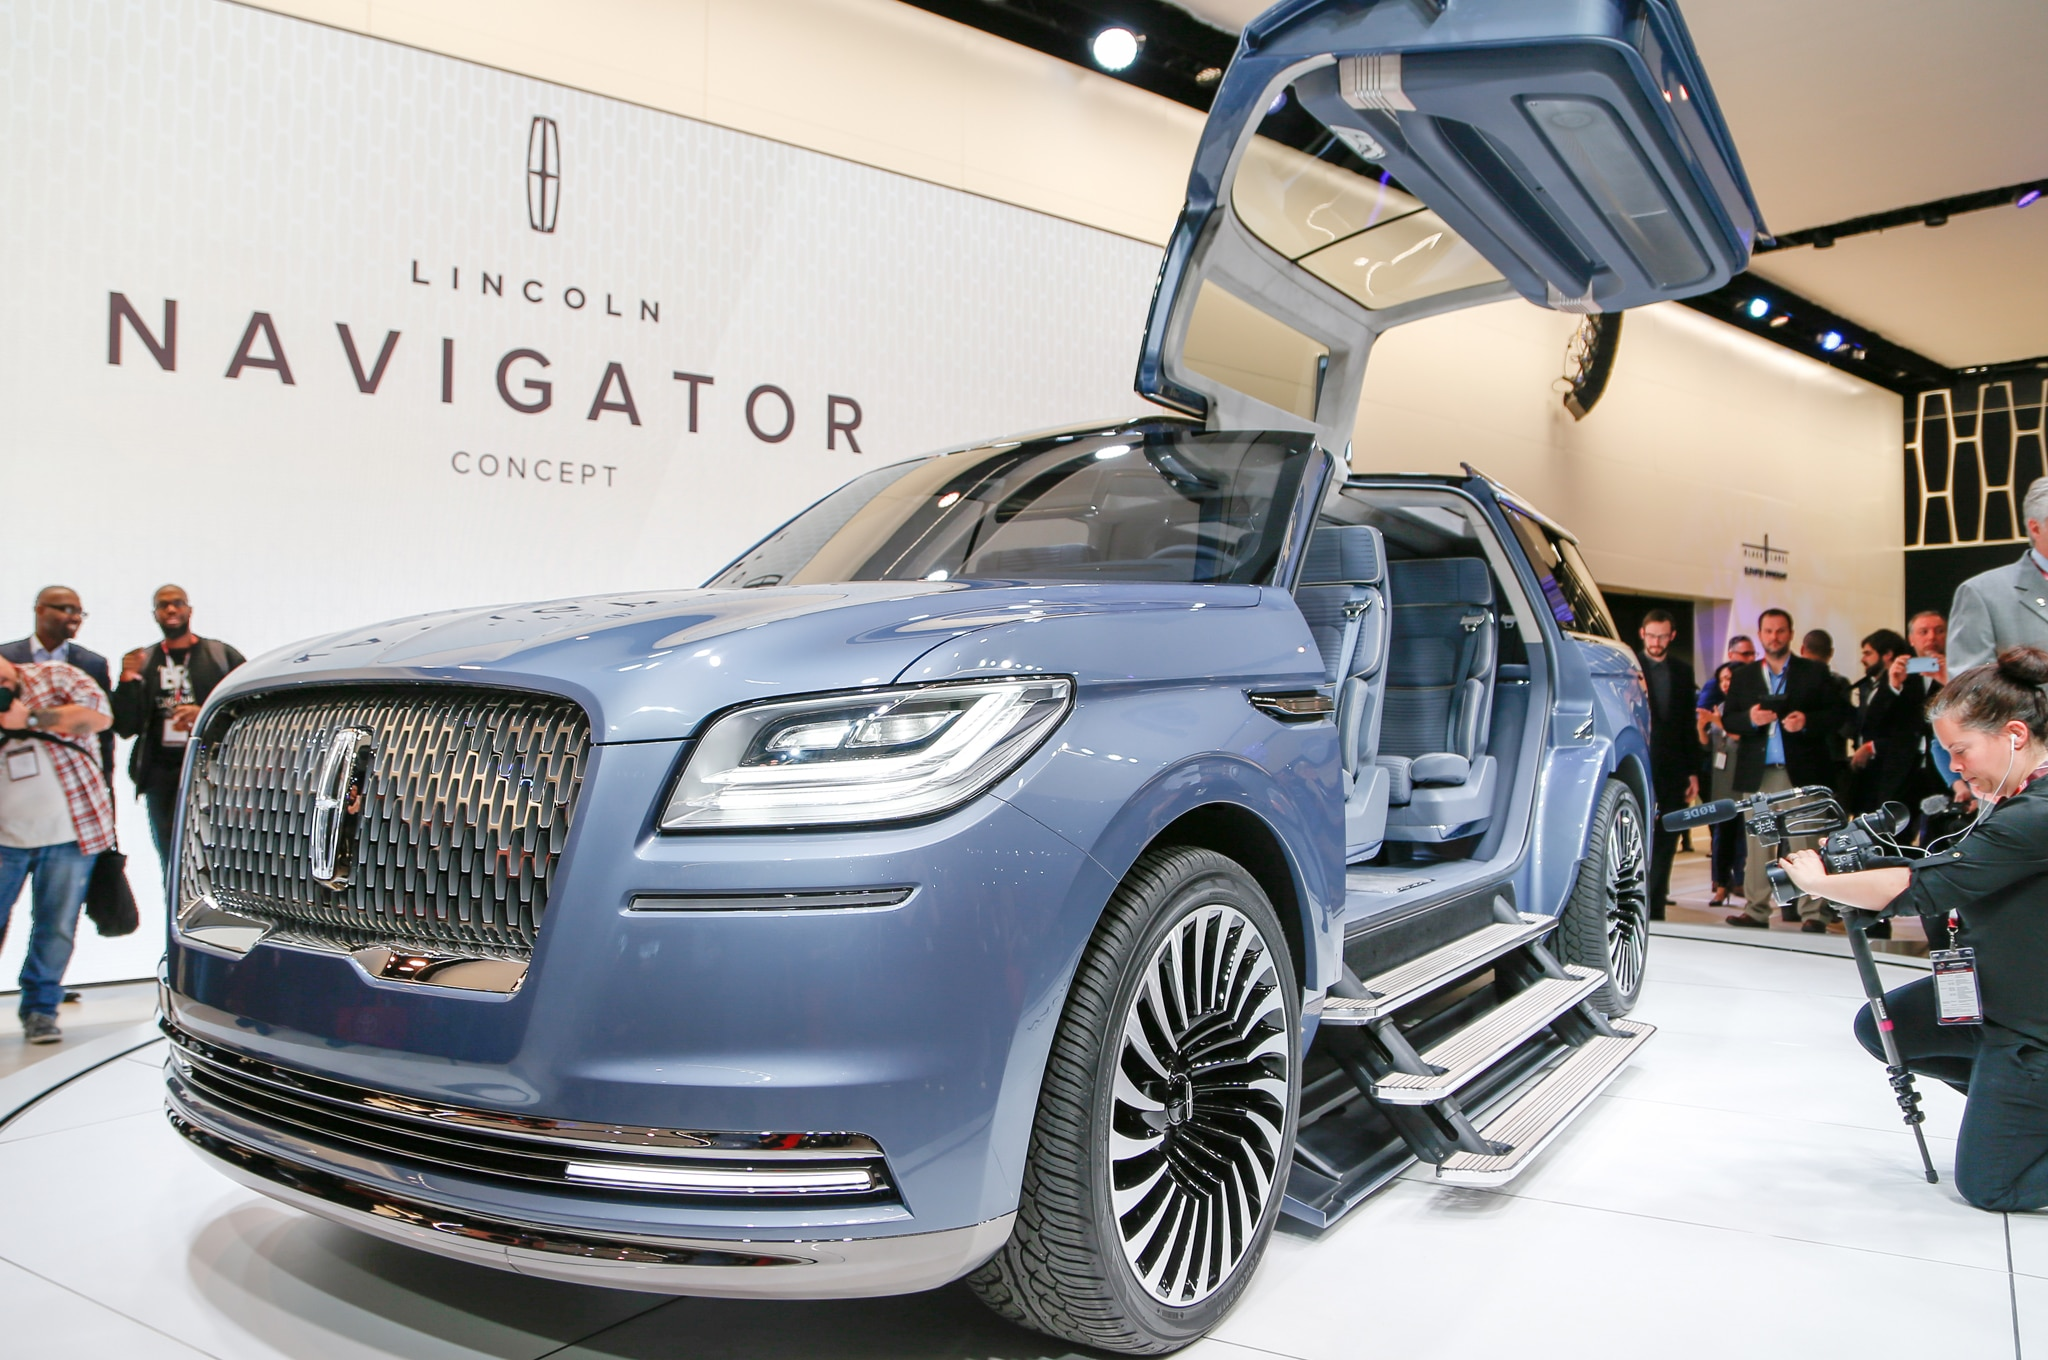 Lincoln Navigator Concept Debuts At 2016 New York Auto Show